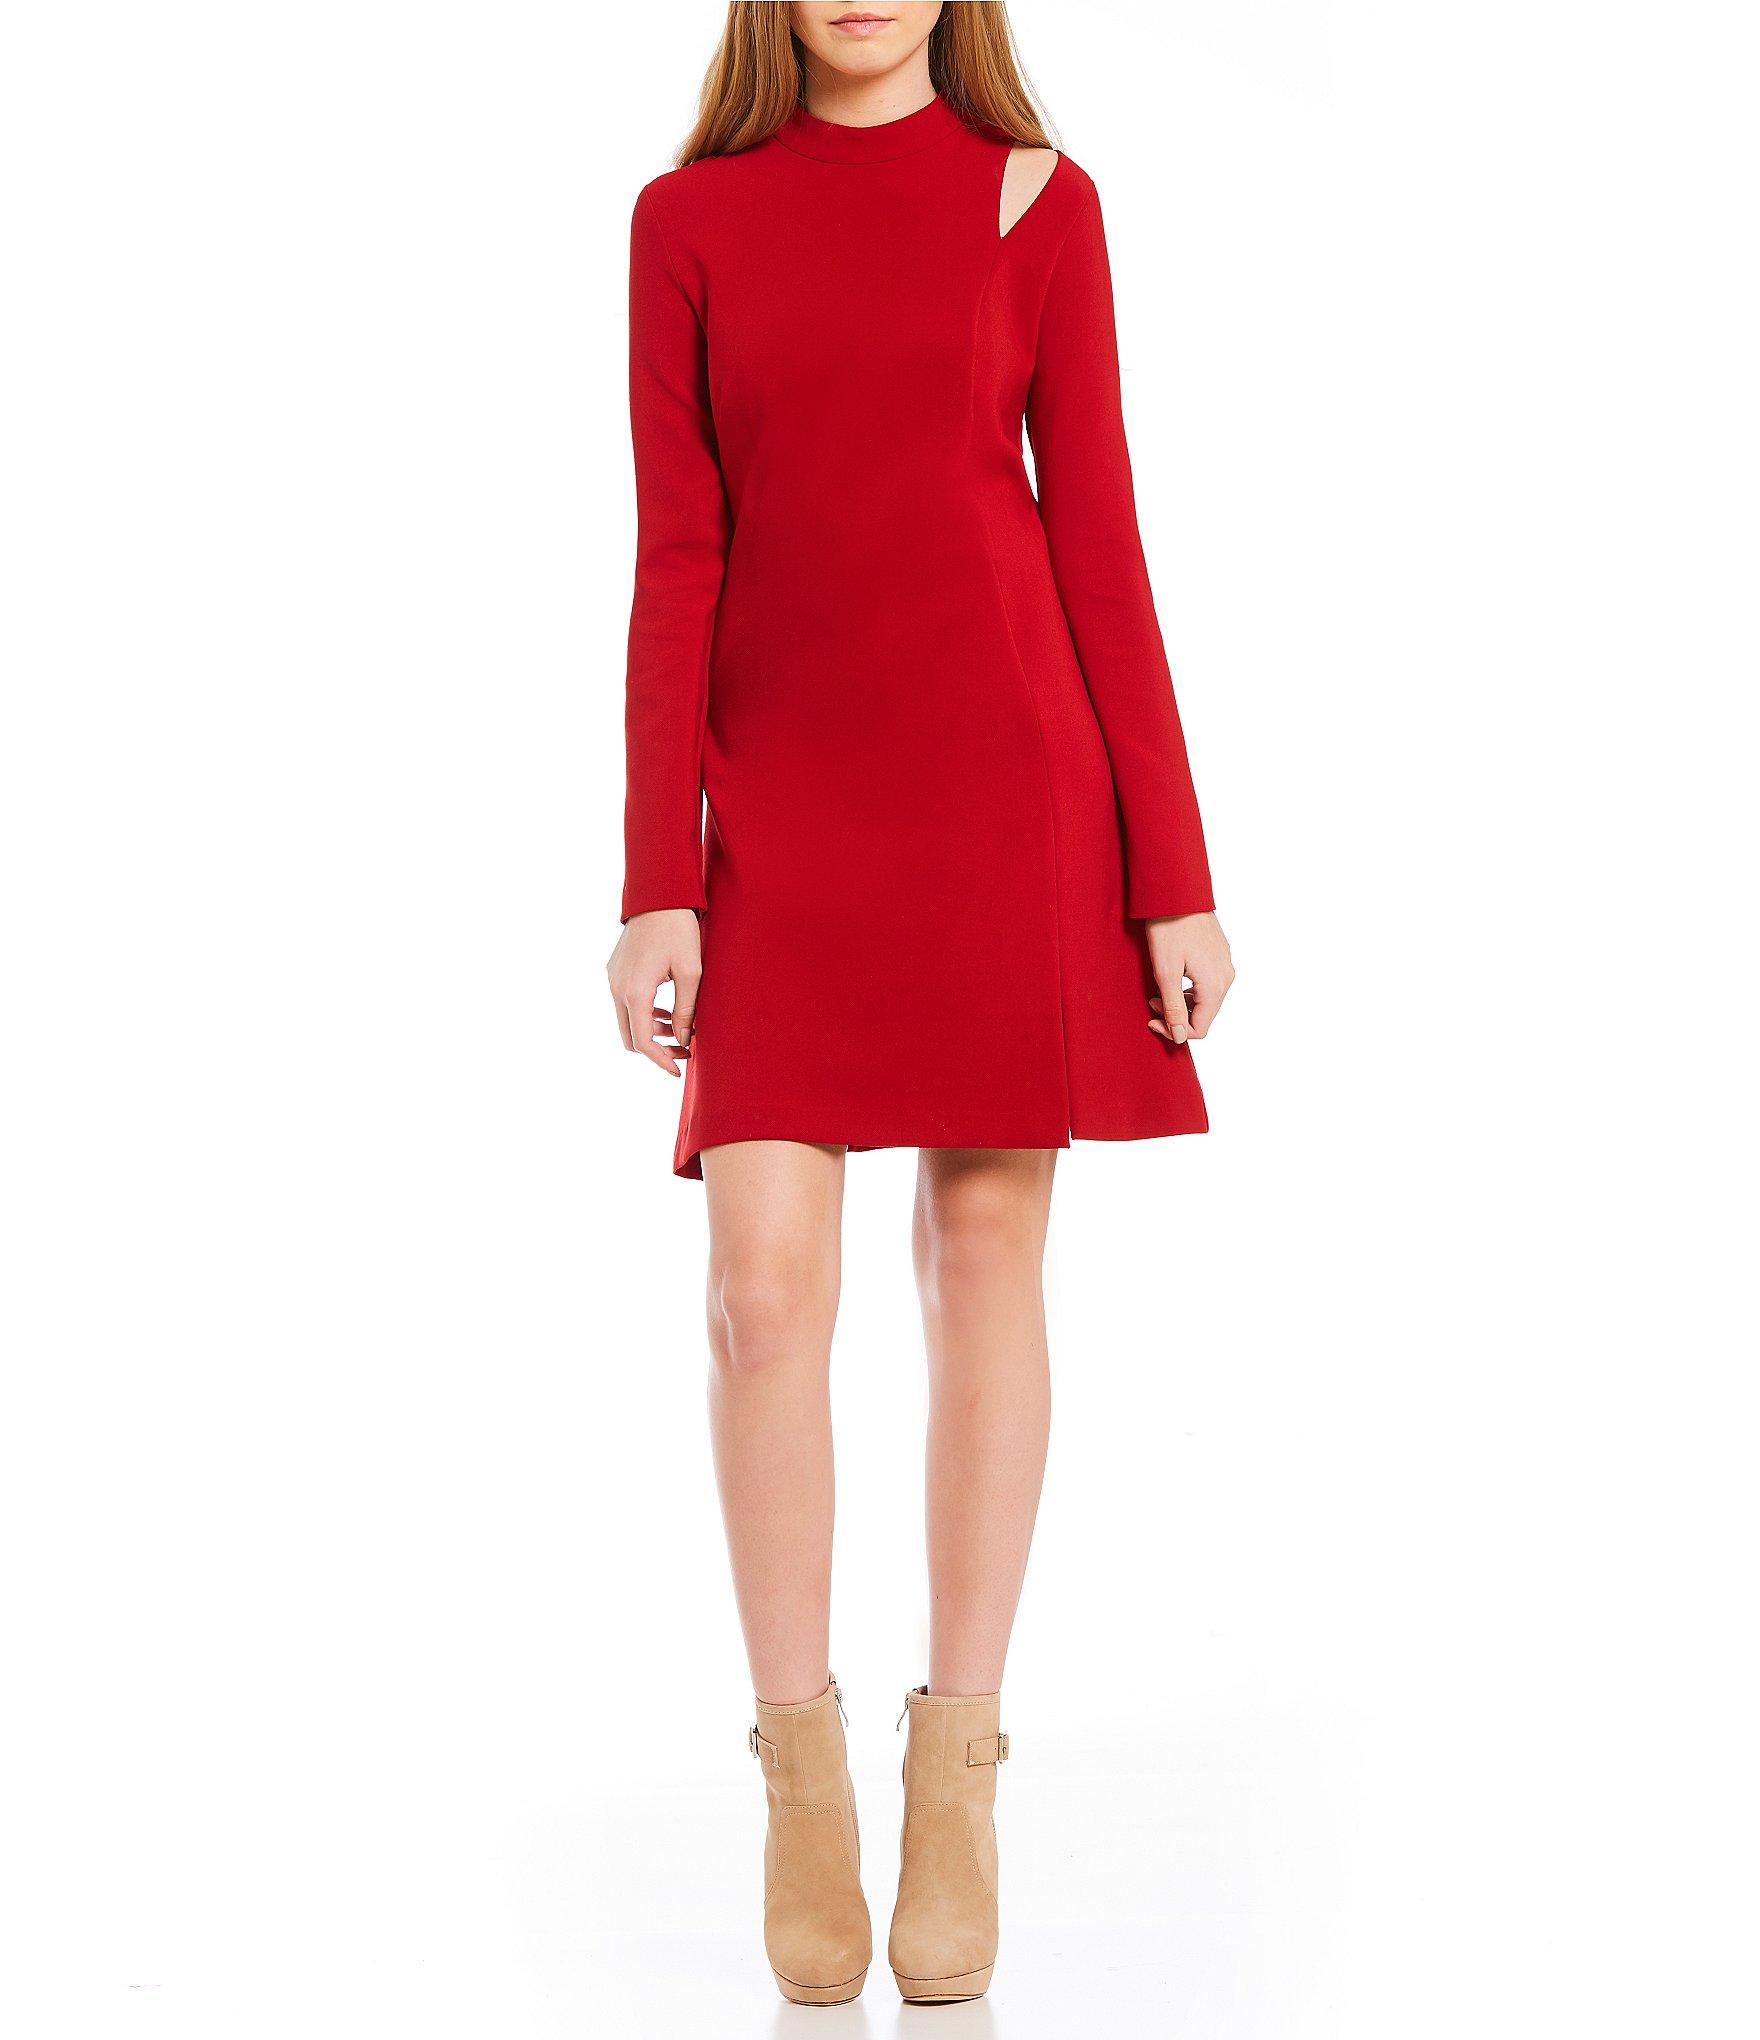 Women\'s Long-Sleeve Cocktail Dresses | Dillards